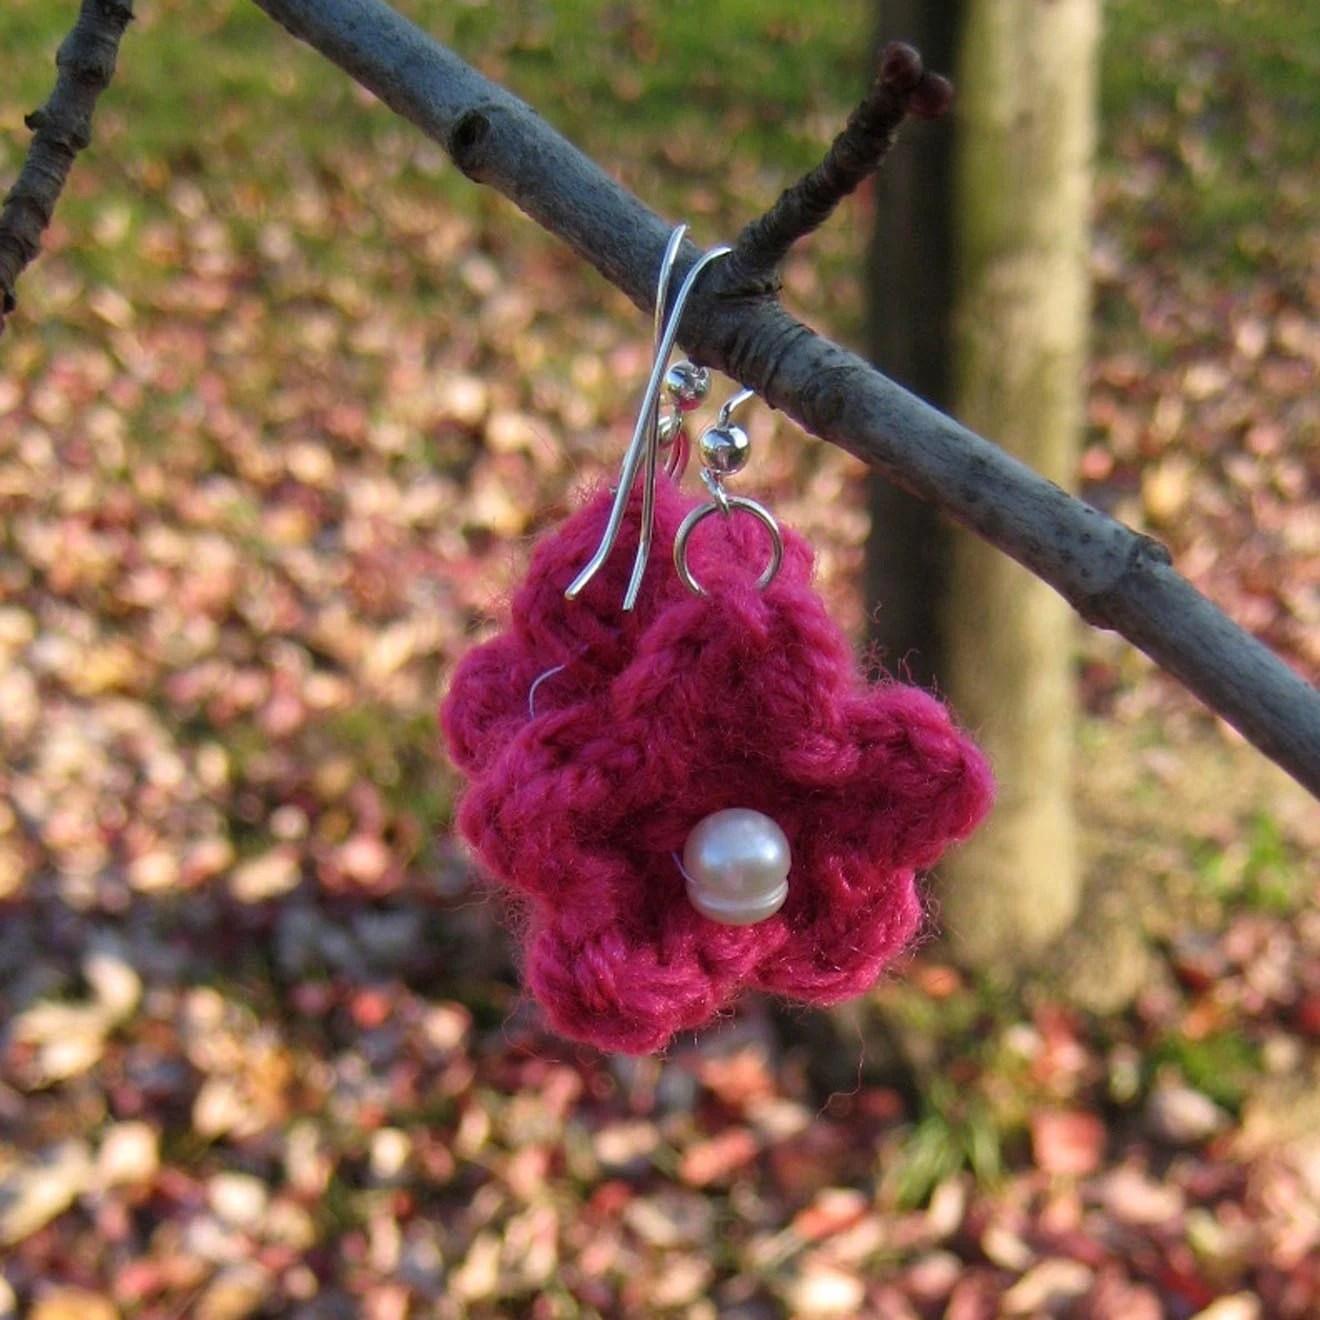 Pink Crochet Flower Earrings with Pearl, $9.00 on ETSY